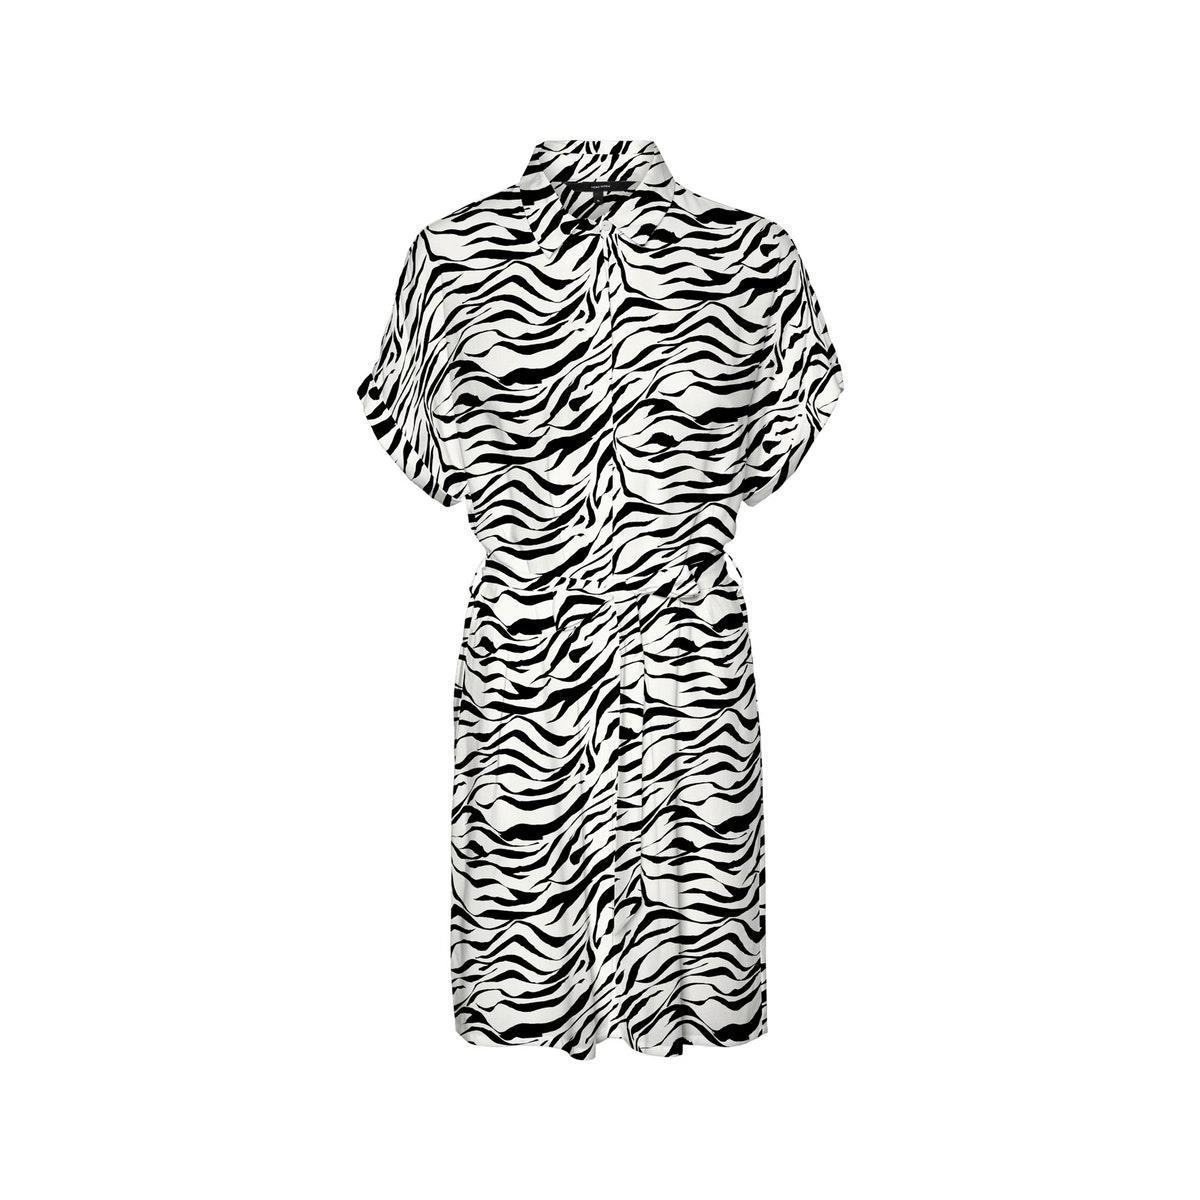 vmsimply easy s/s shirt dress wvn g 10227837 vero moda jurk black/zanzana